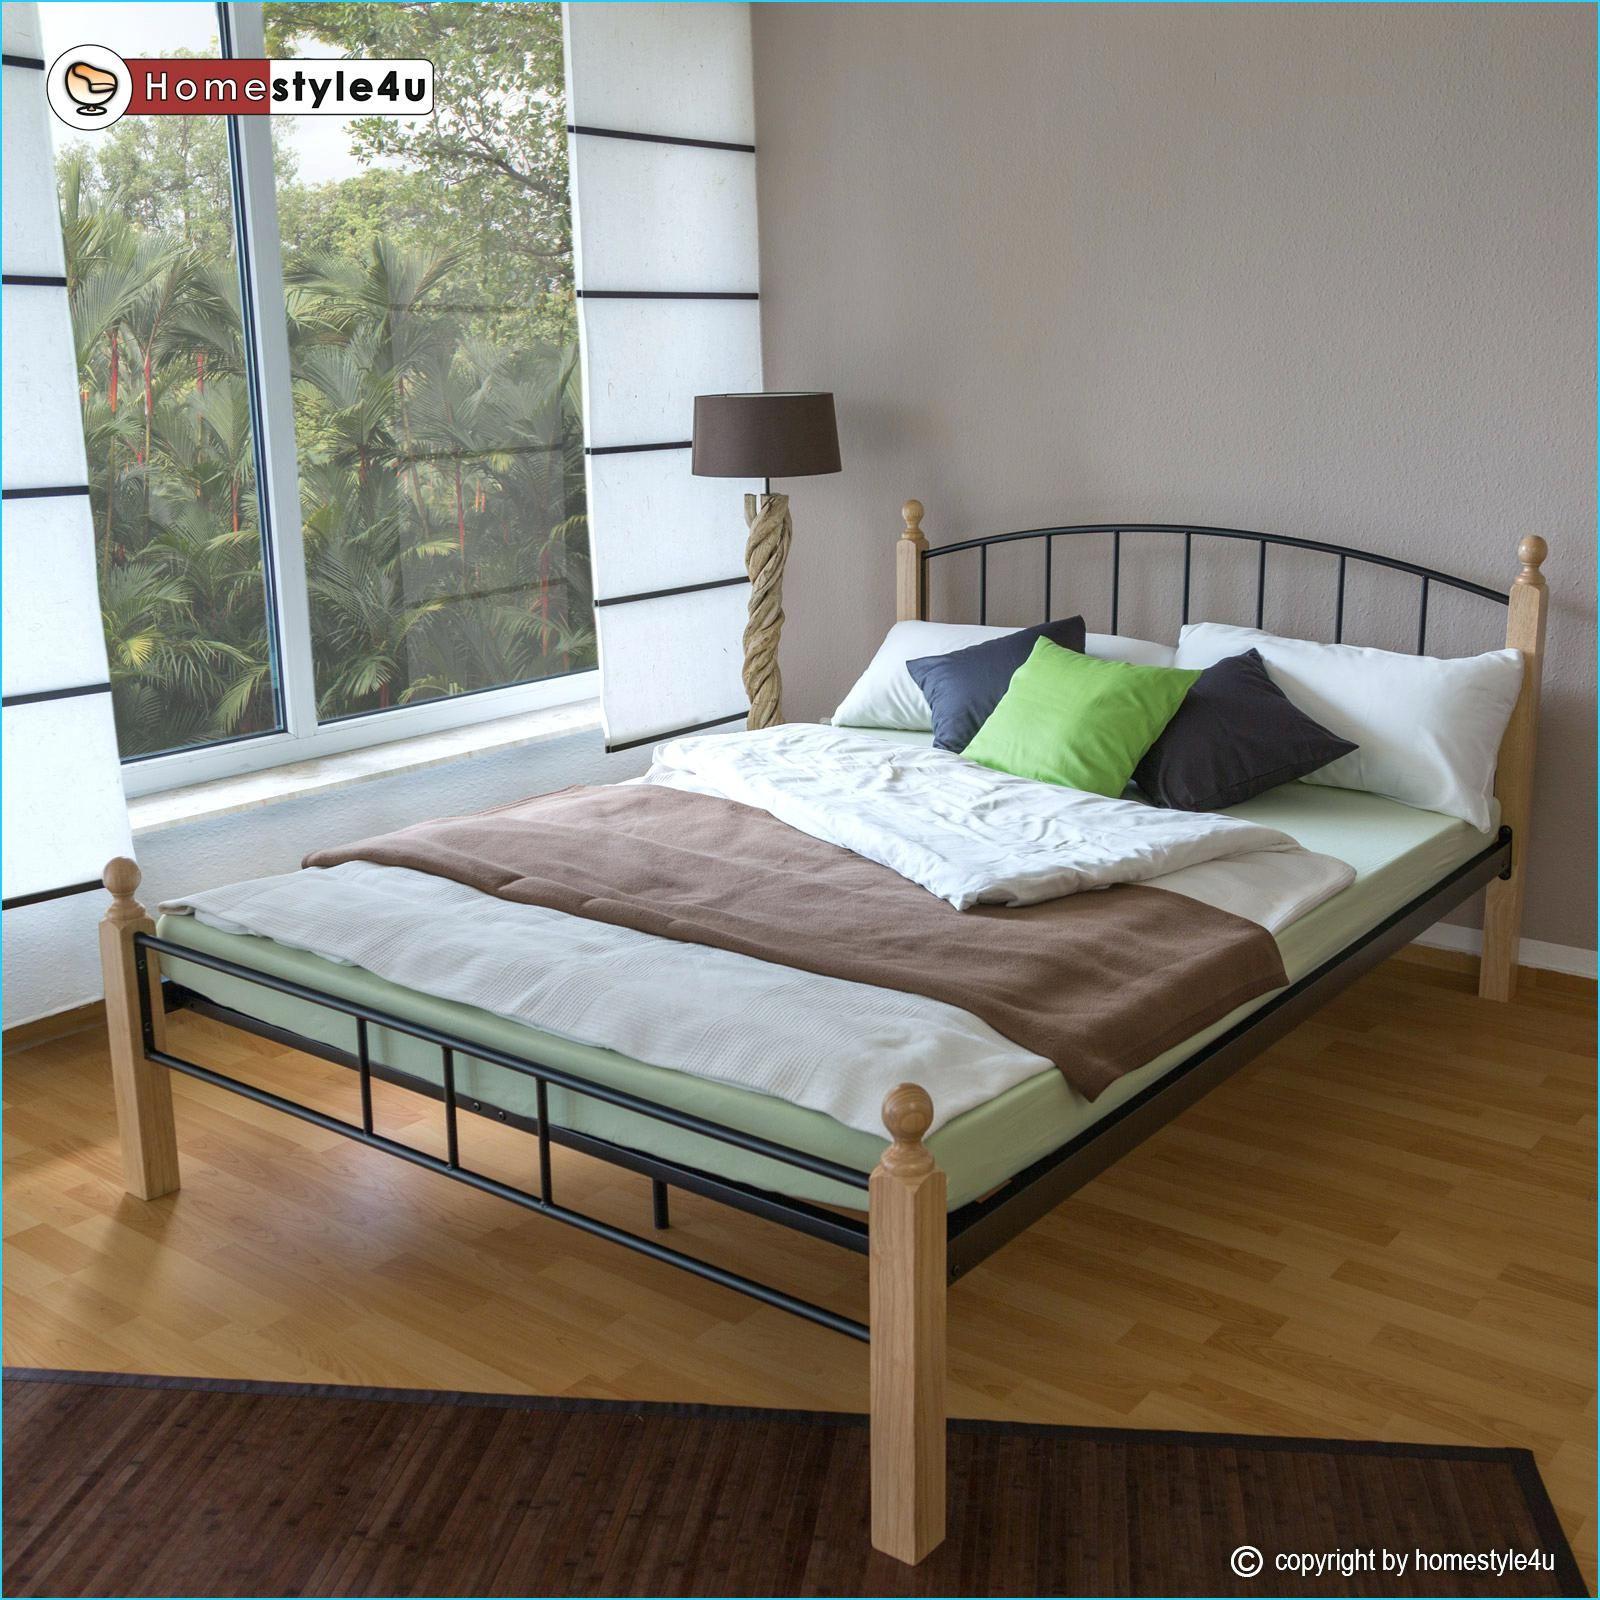 Doppelbett Mit Lattenrost Bett 120x200 Inkl Und Matratze Betten